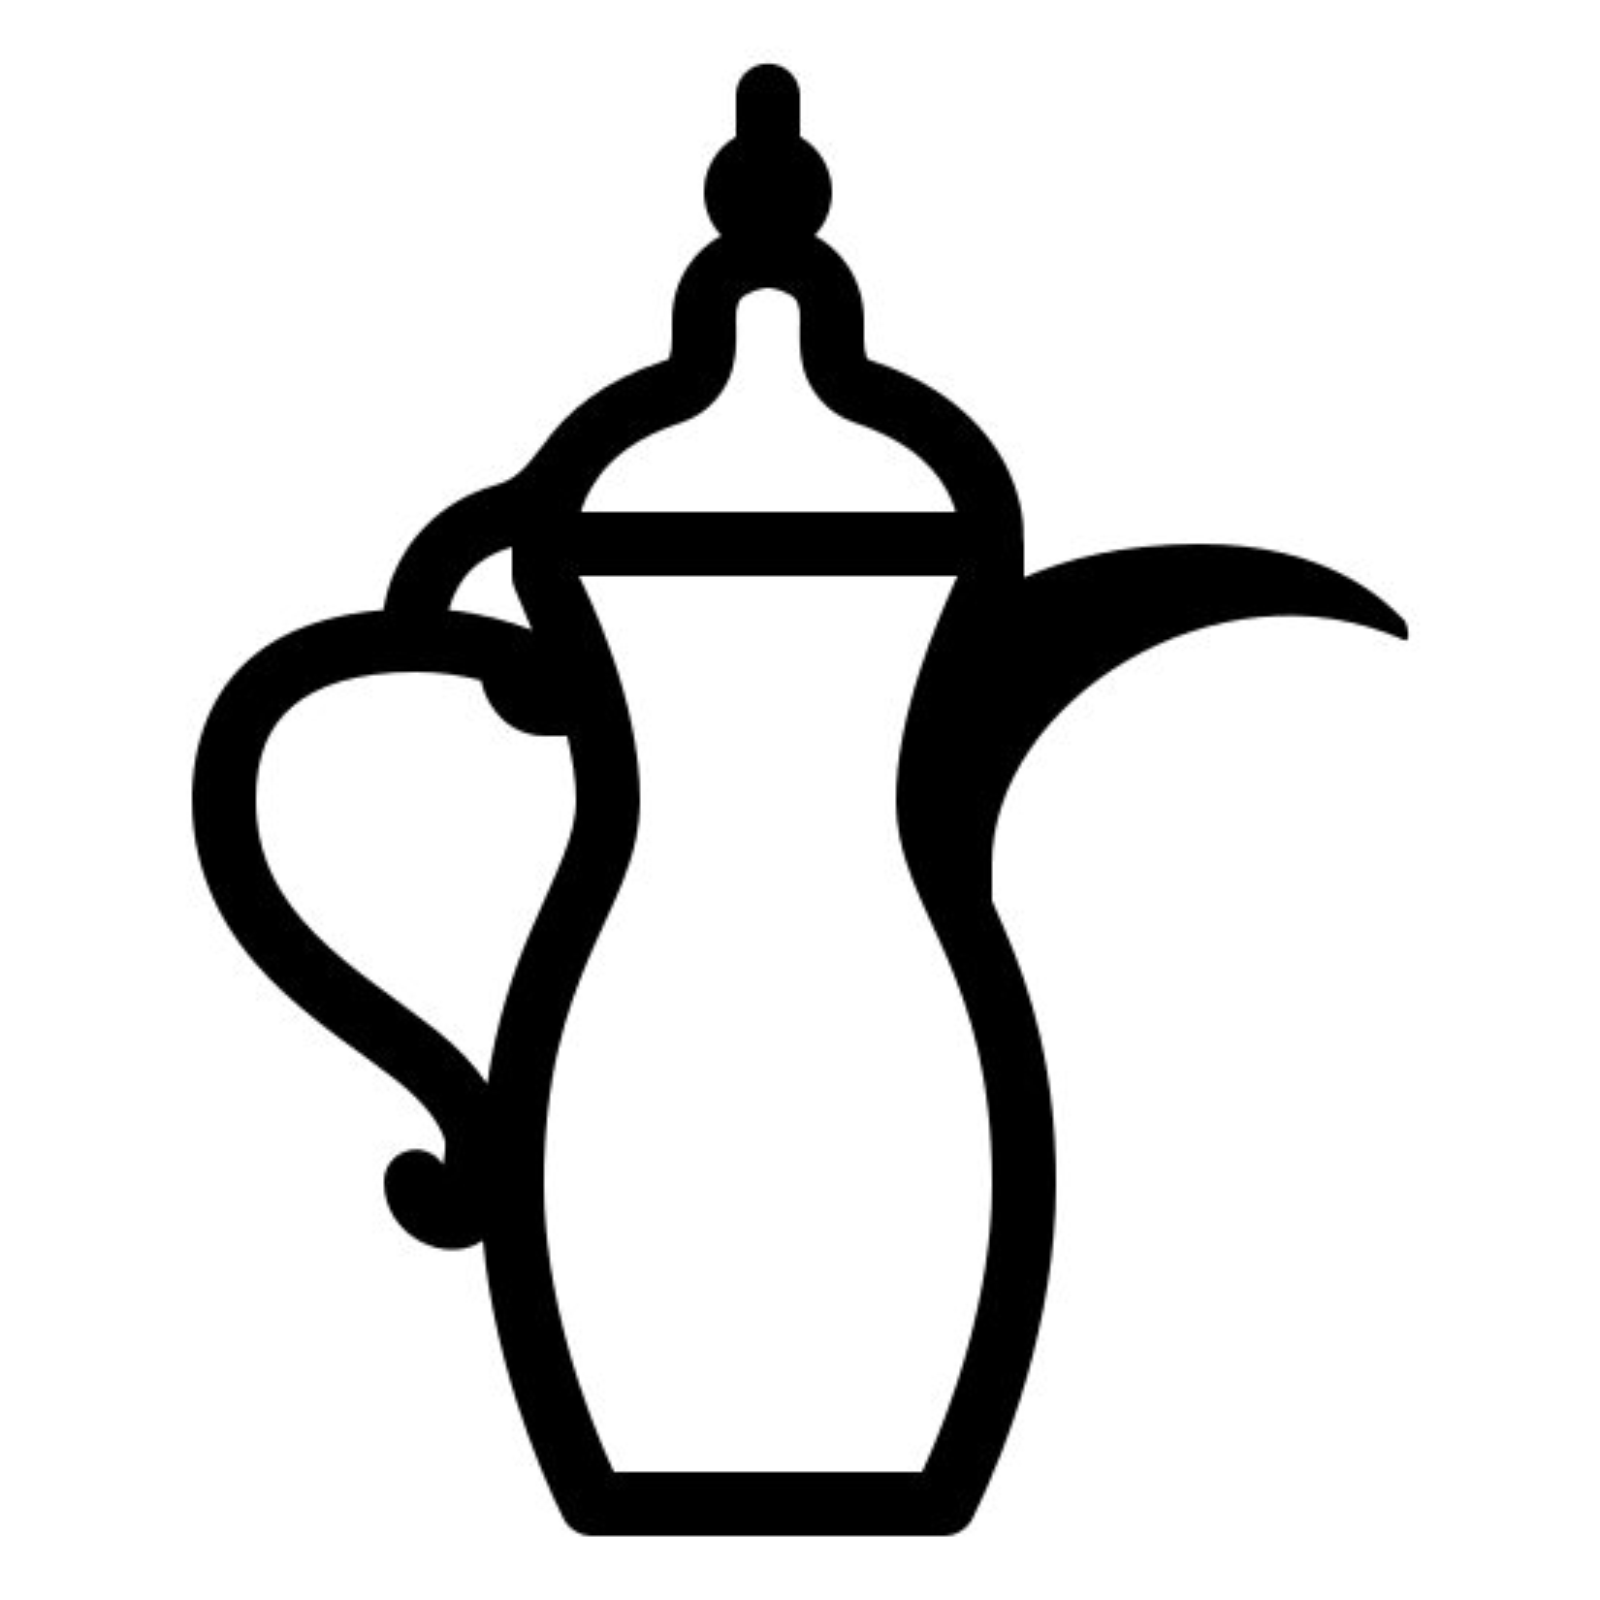 Emirati Traditional Coffee Pot icon